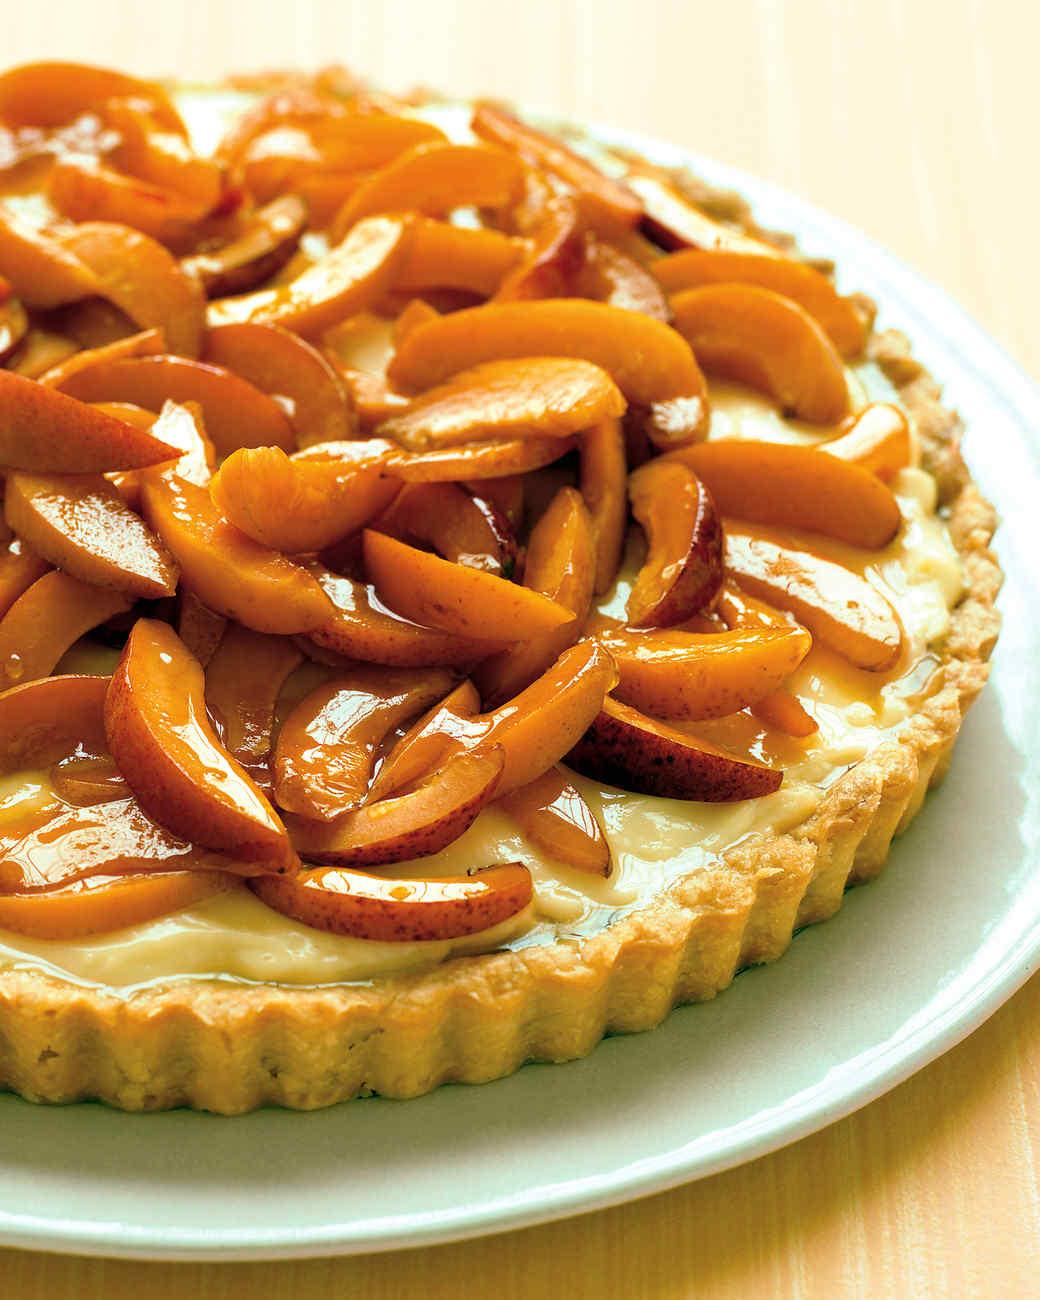 Everyday Apricot Tart